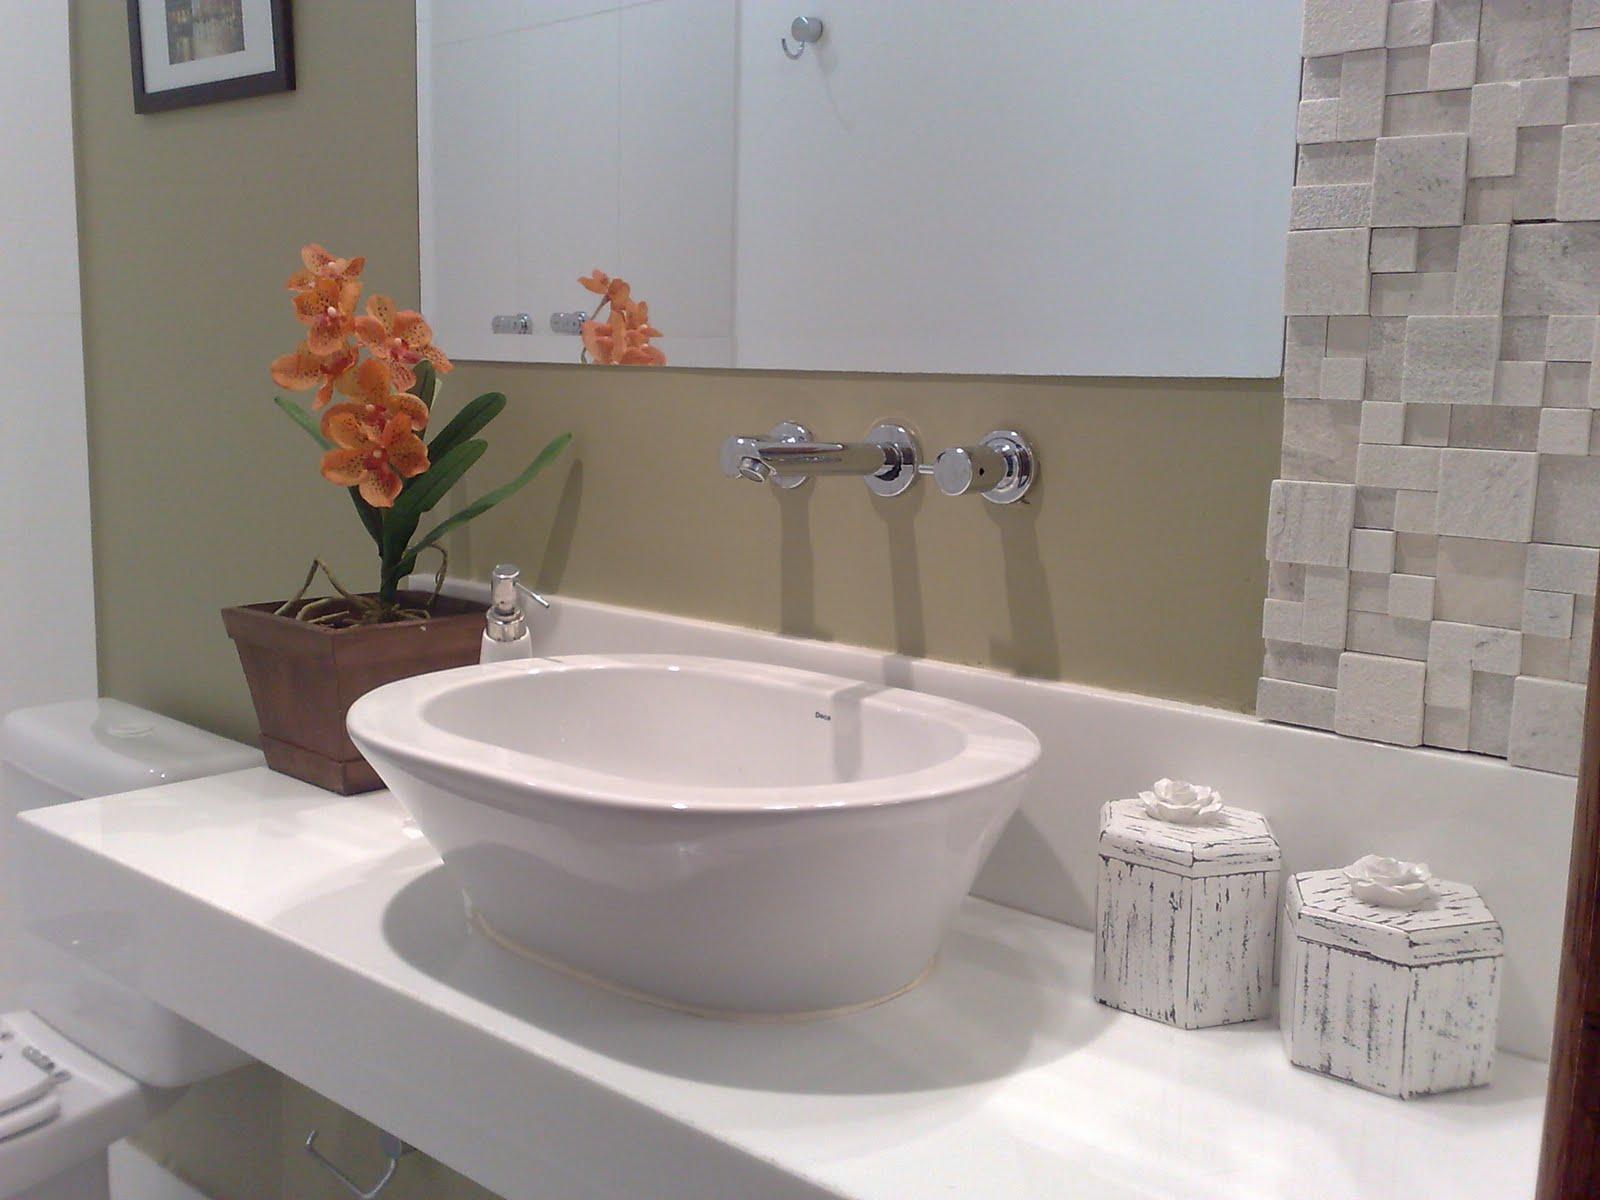 lavabo decoracao barata:Decoracao De Lavabo